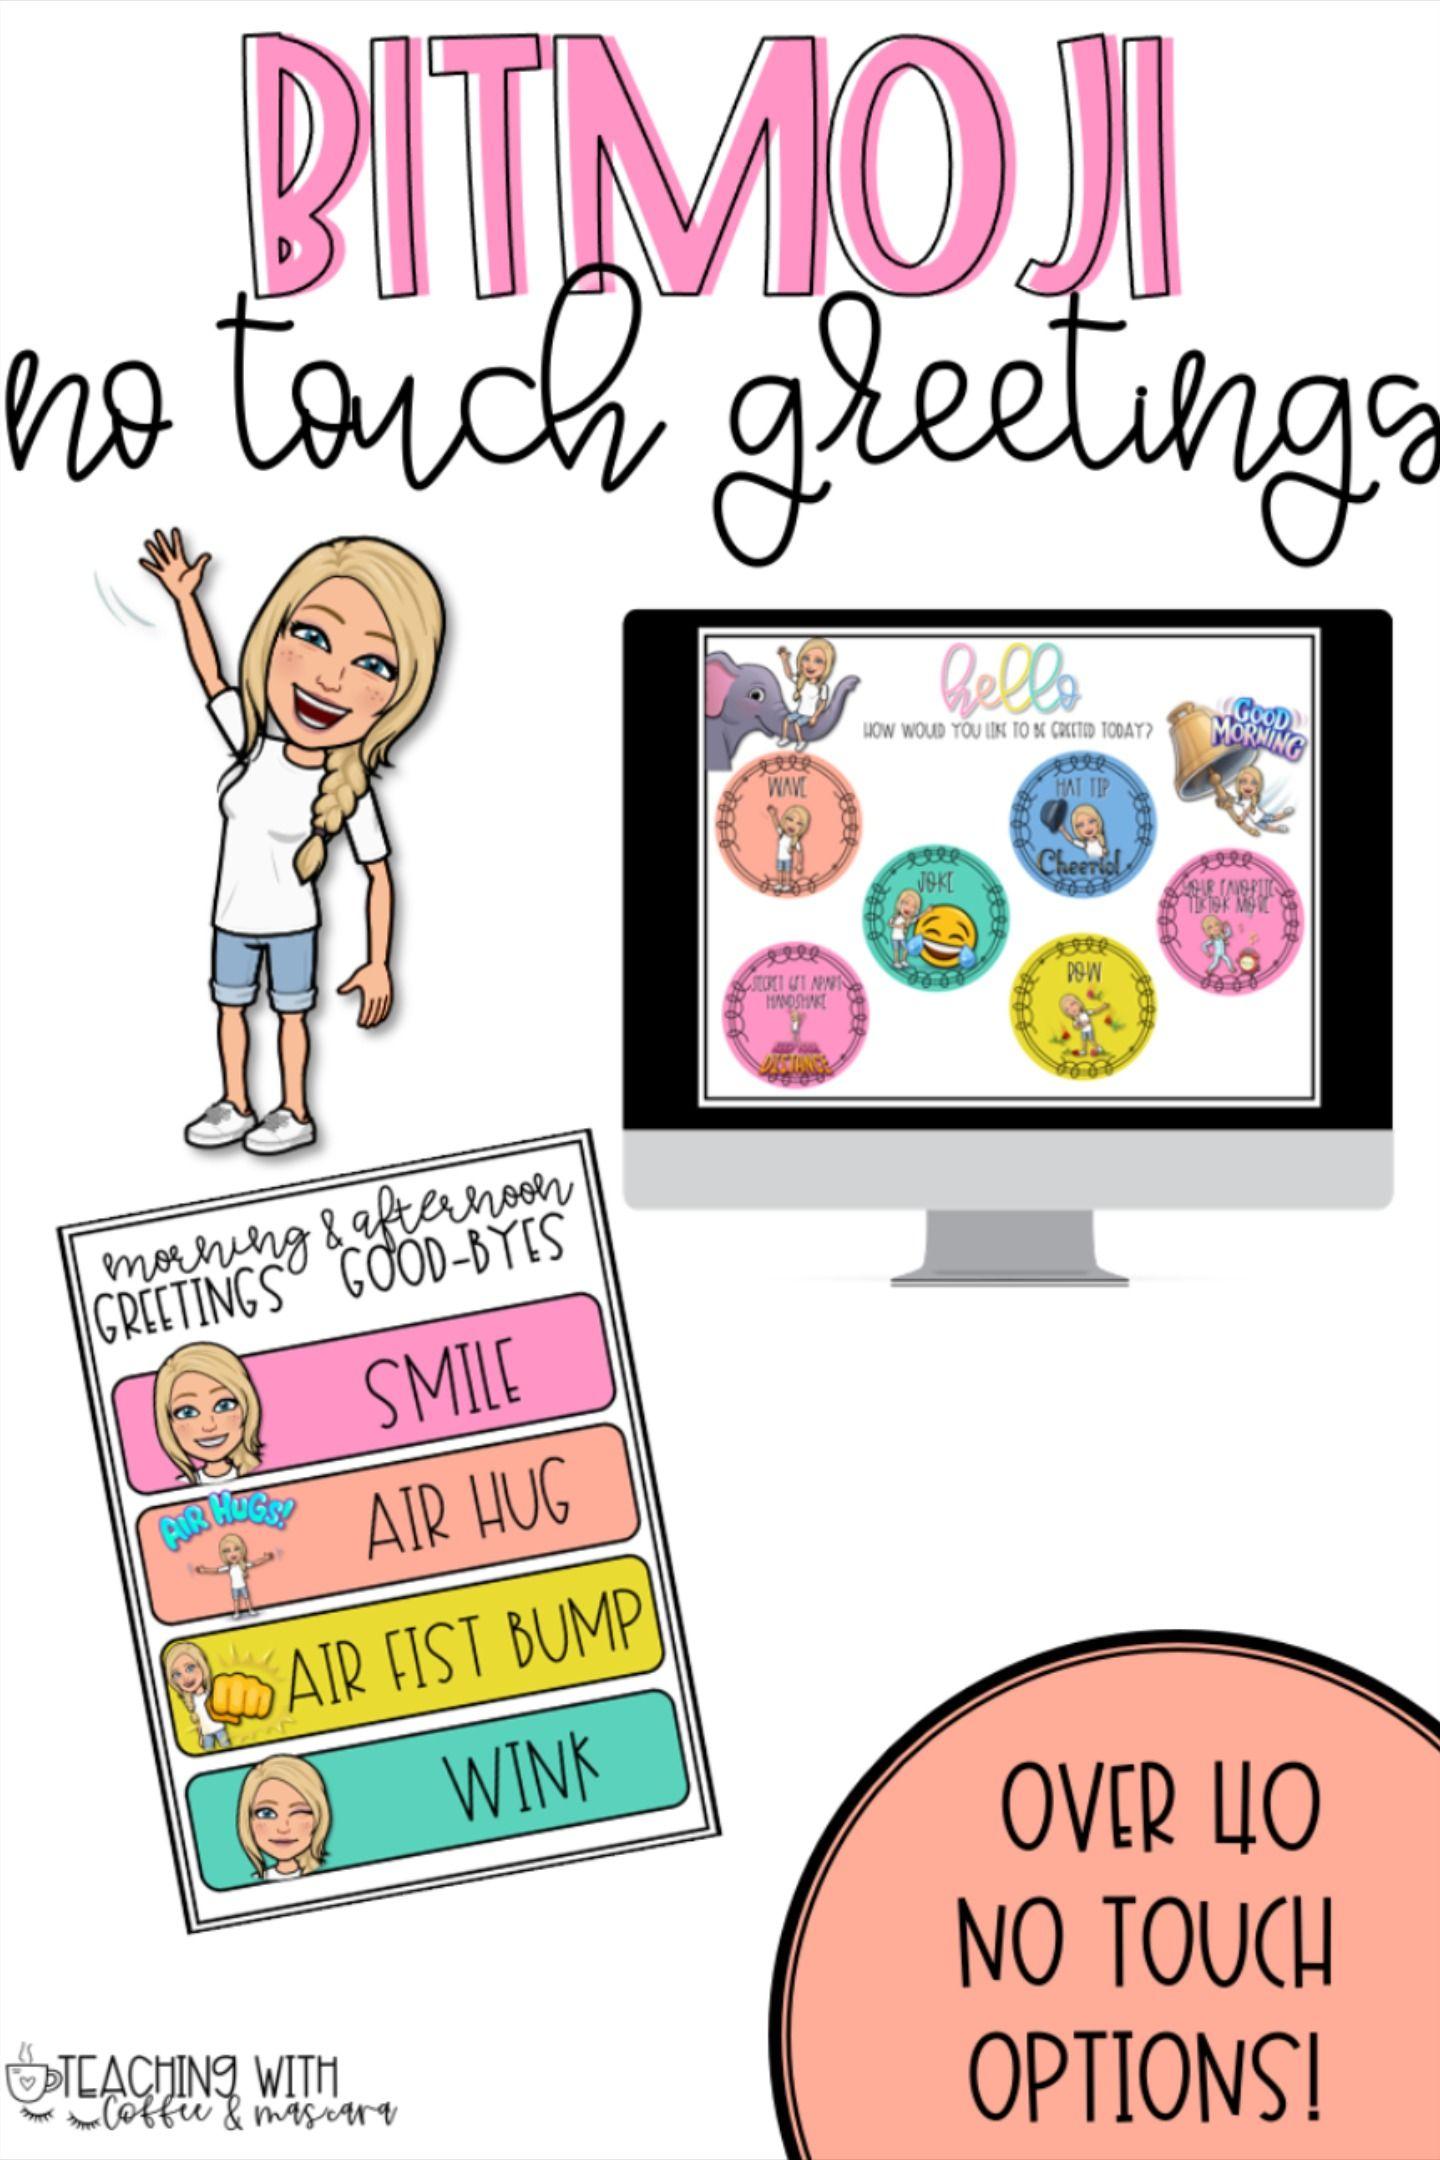 Bitmoji Touchless Greetings Classroom Meetings Greetings First Day Of School Activities [ 2160 x 1440 Pixel ]